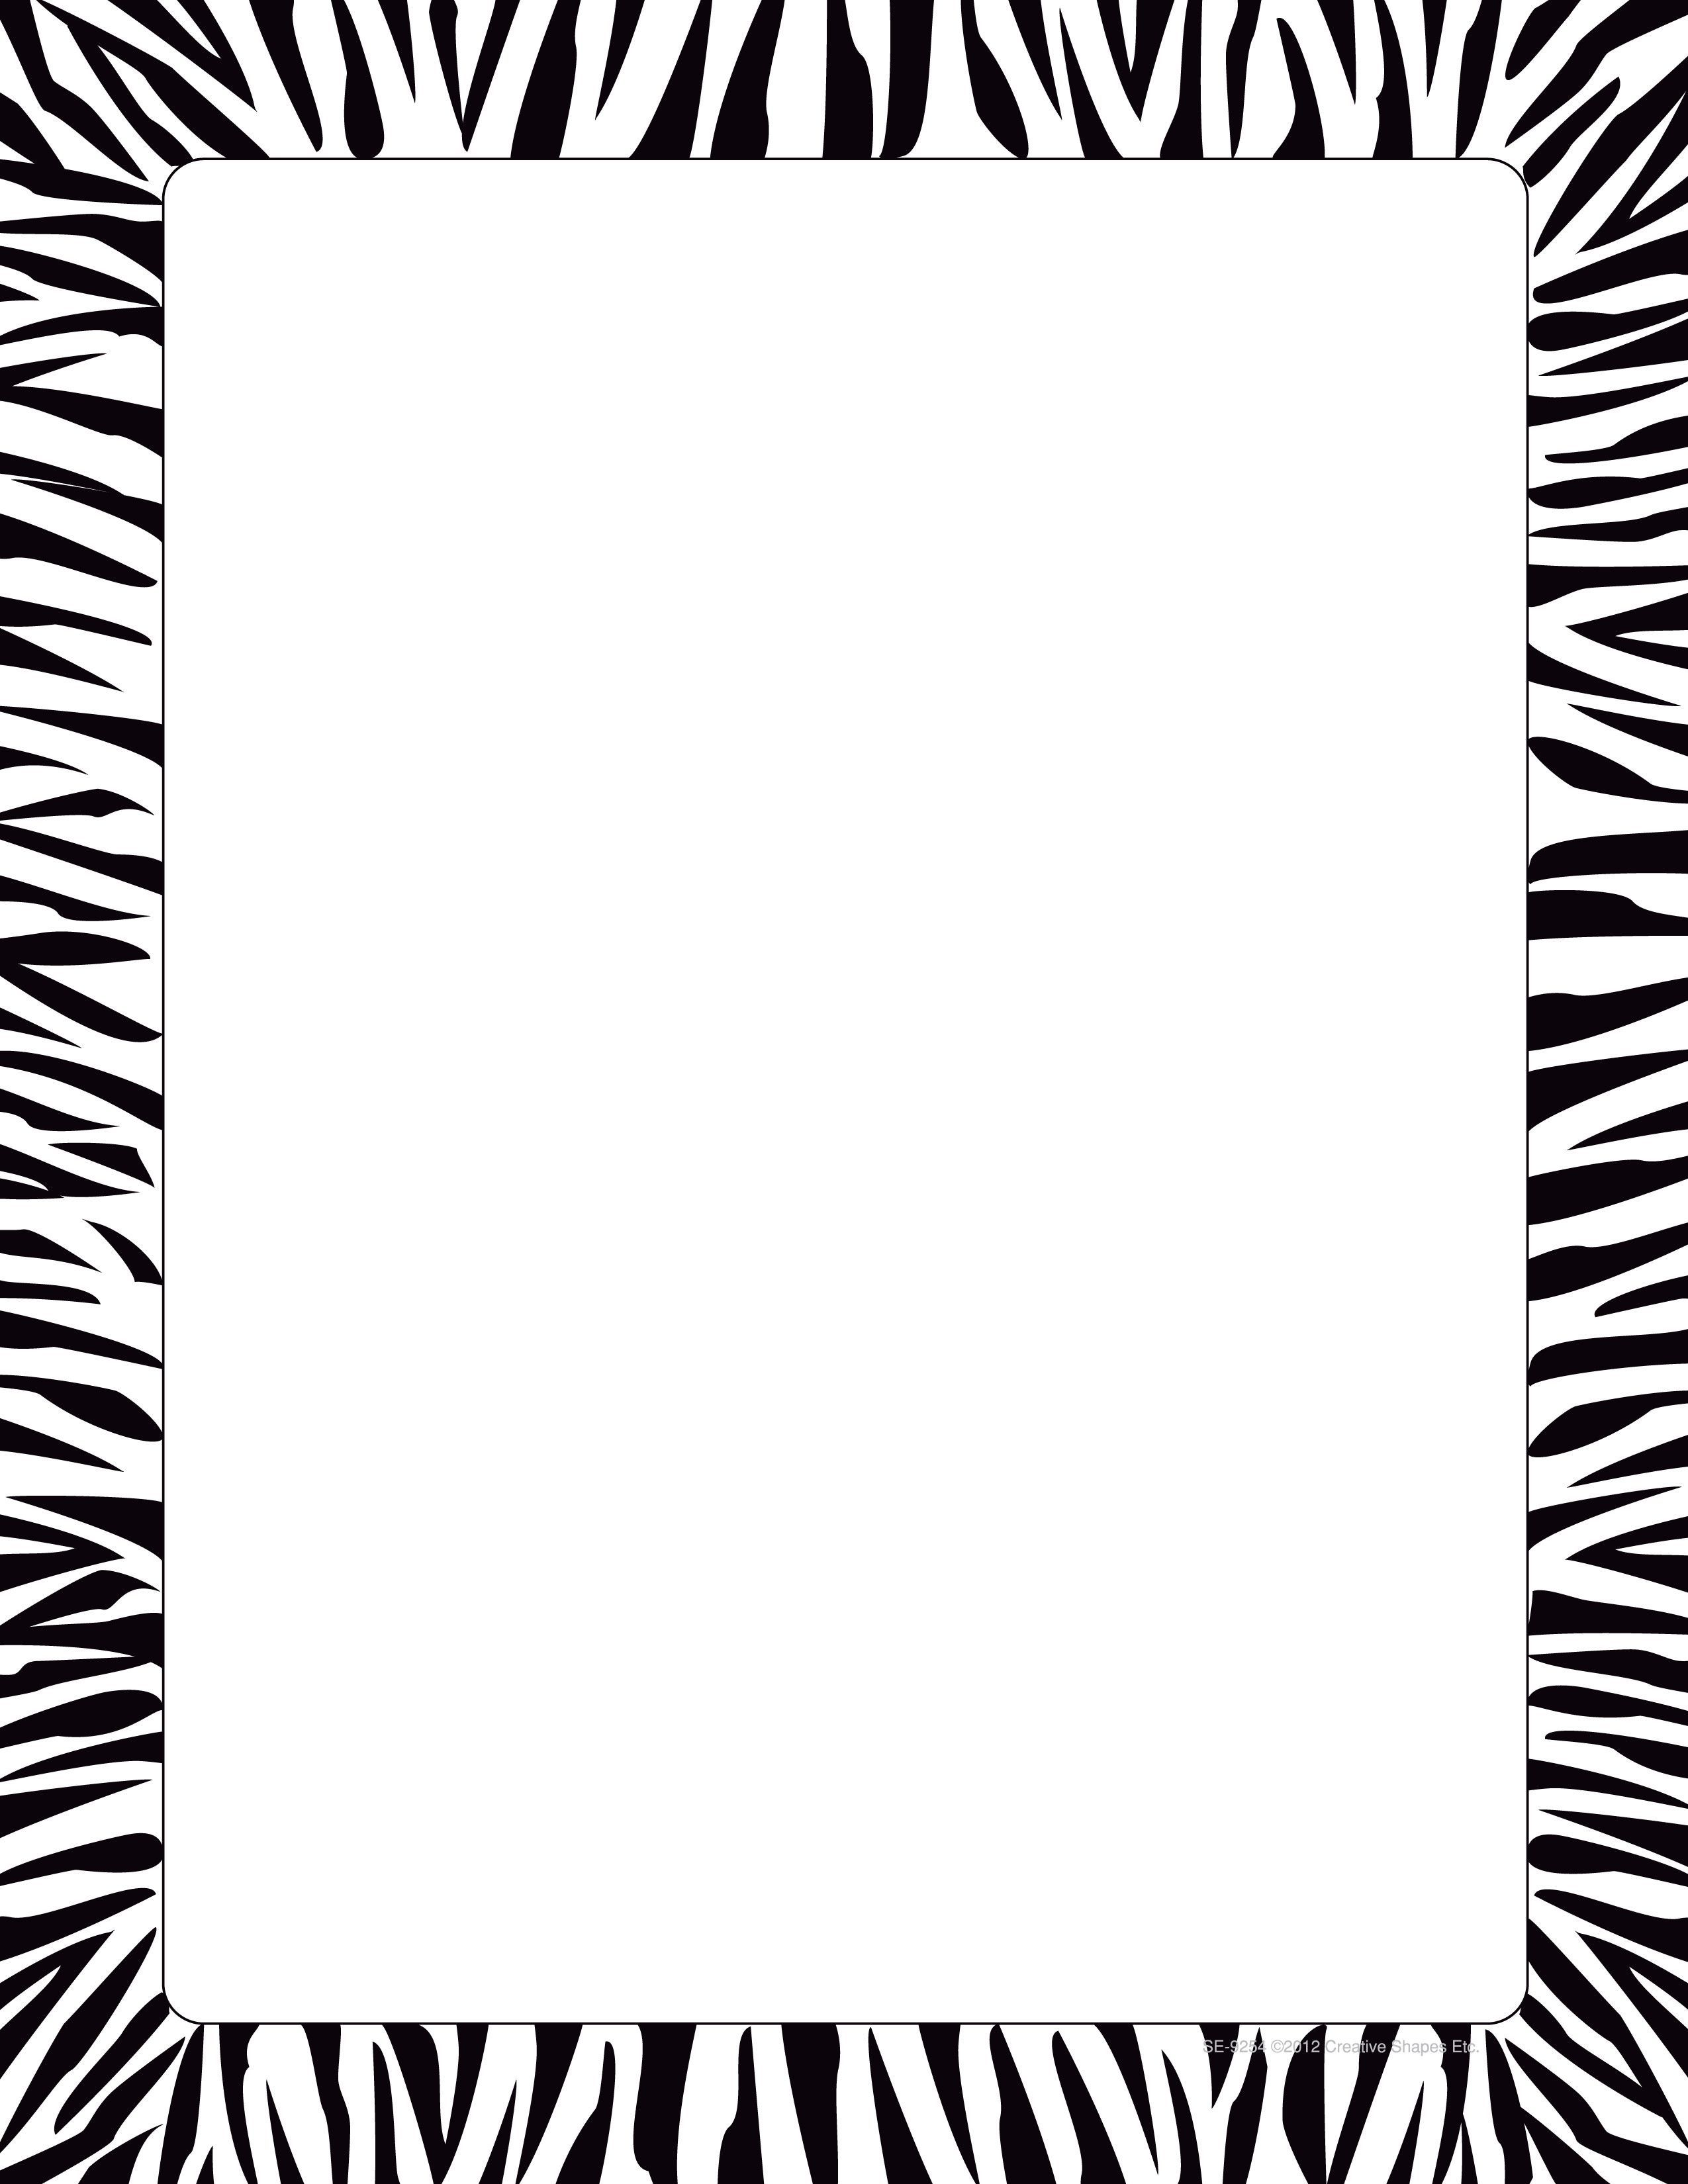 Zebra Rainbow Poster Zazzlecom In Art Zebra Art Zebra